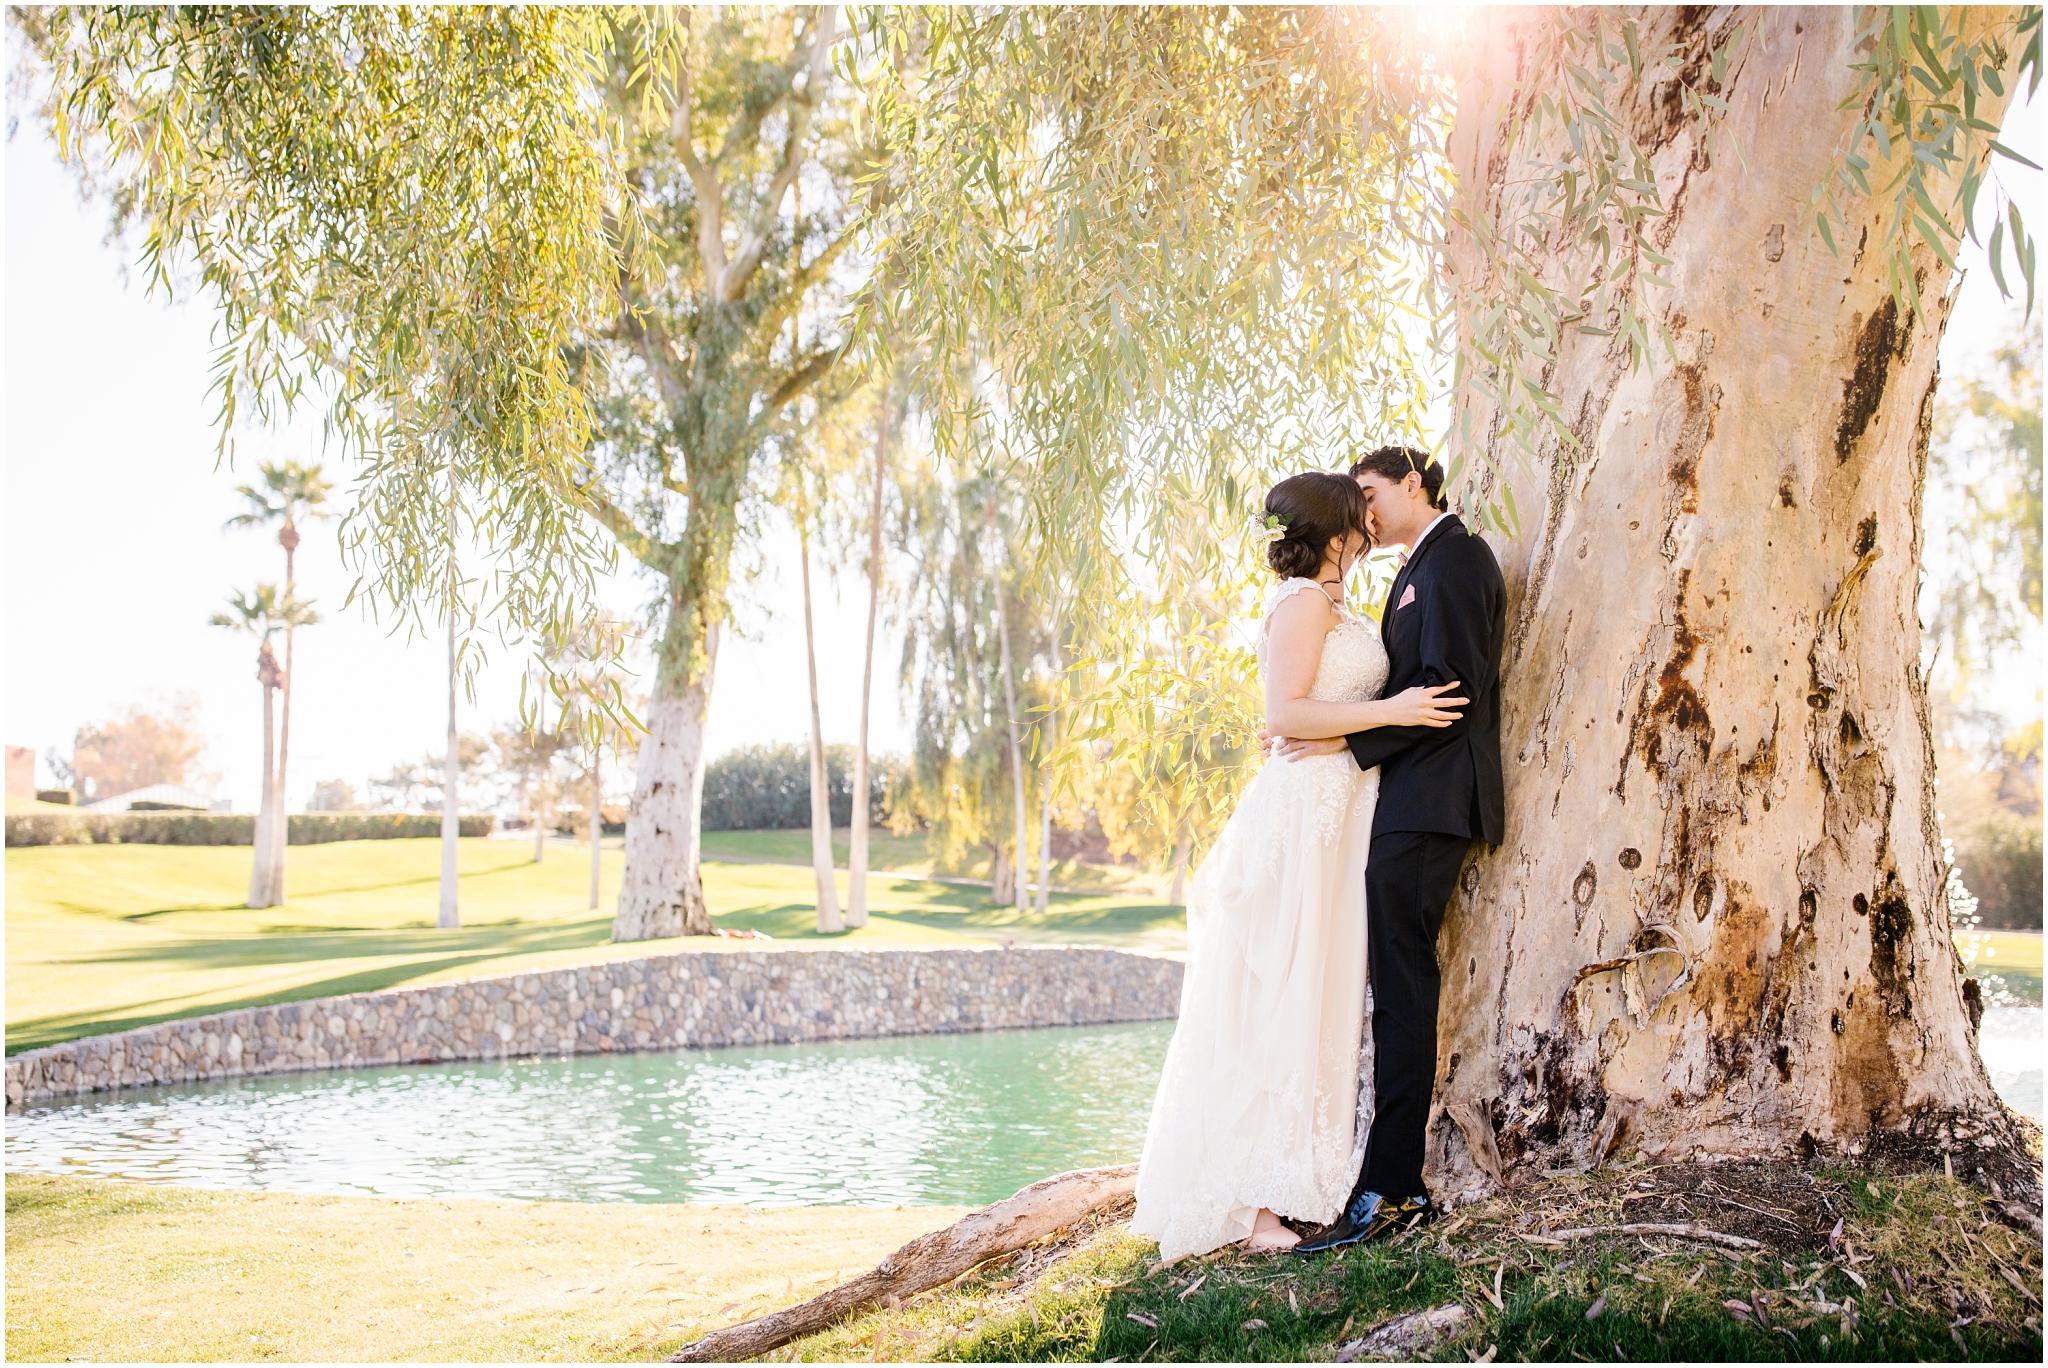 Marissa Nathan-2print_Lizzie-B-Imagery-Arizona-Wedding-Photographer-Salt-Lake-City-Temple-Park-City-Phoenix-Mesa-County-Club.jpg